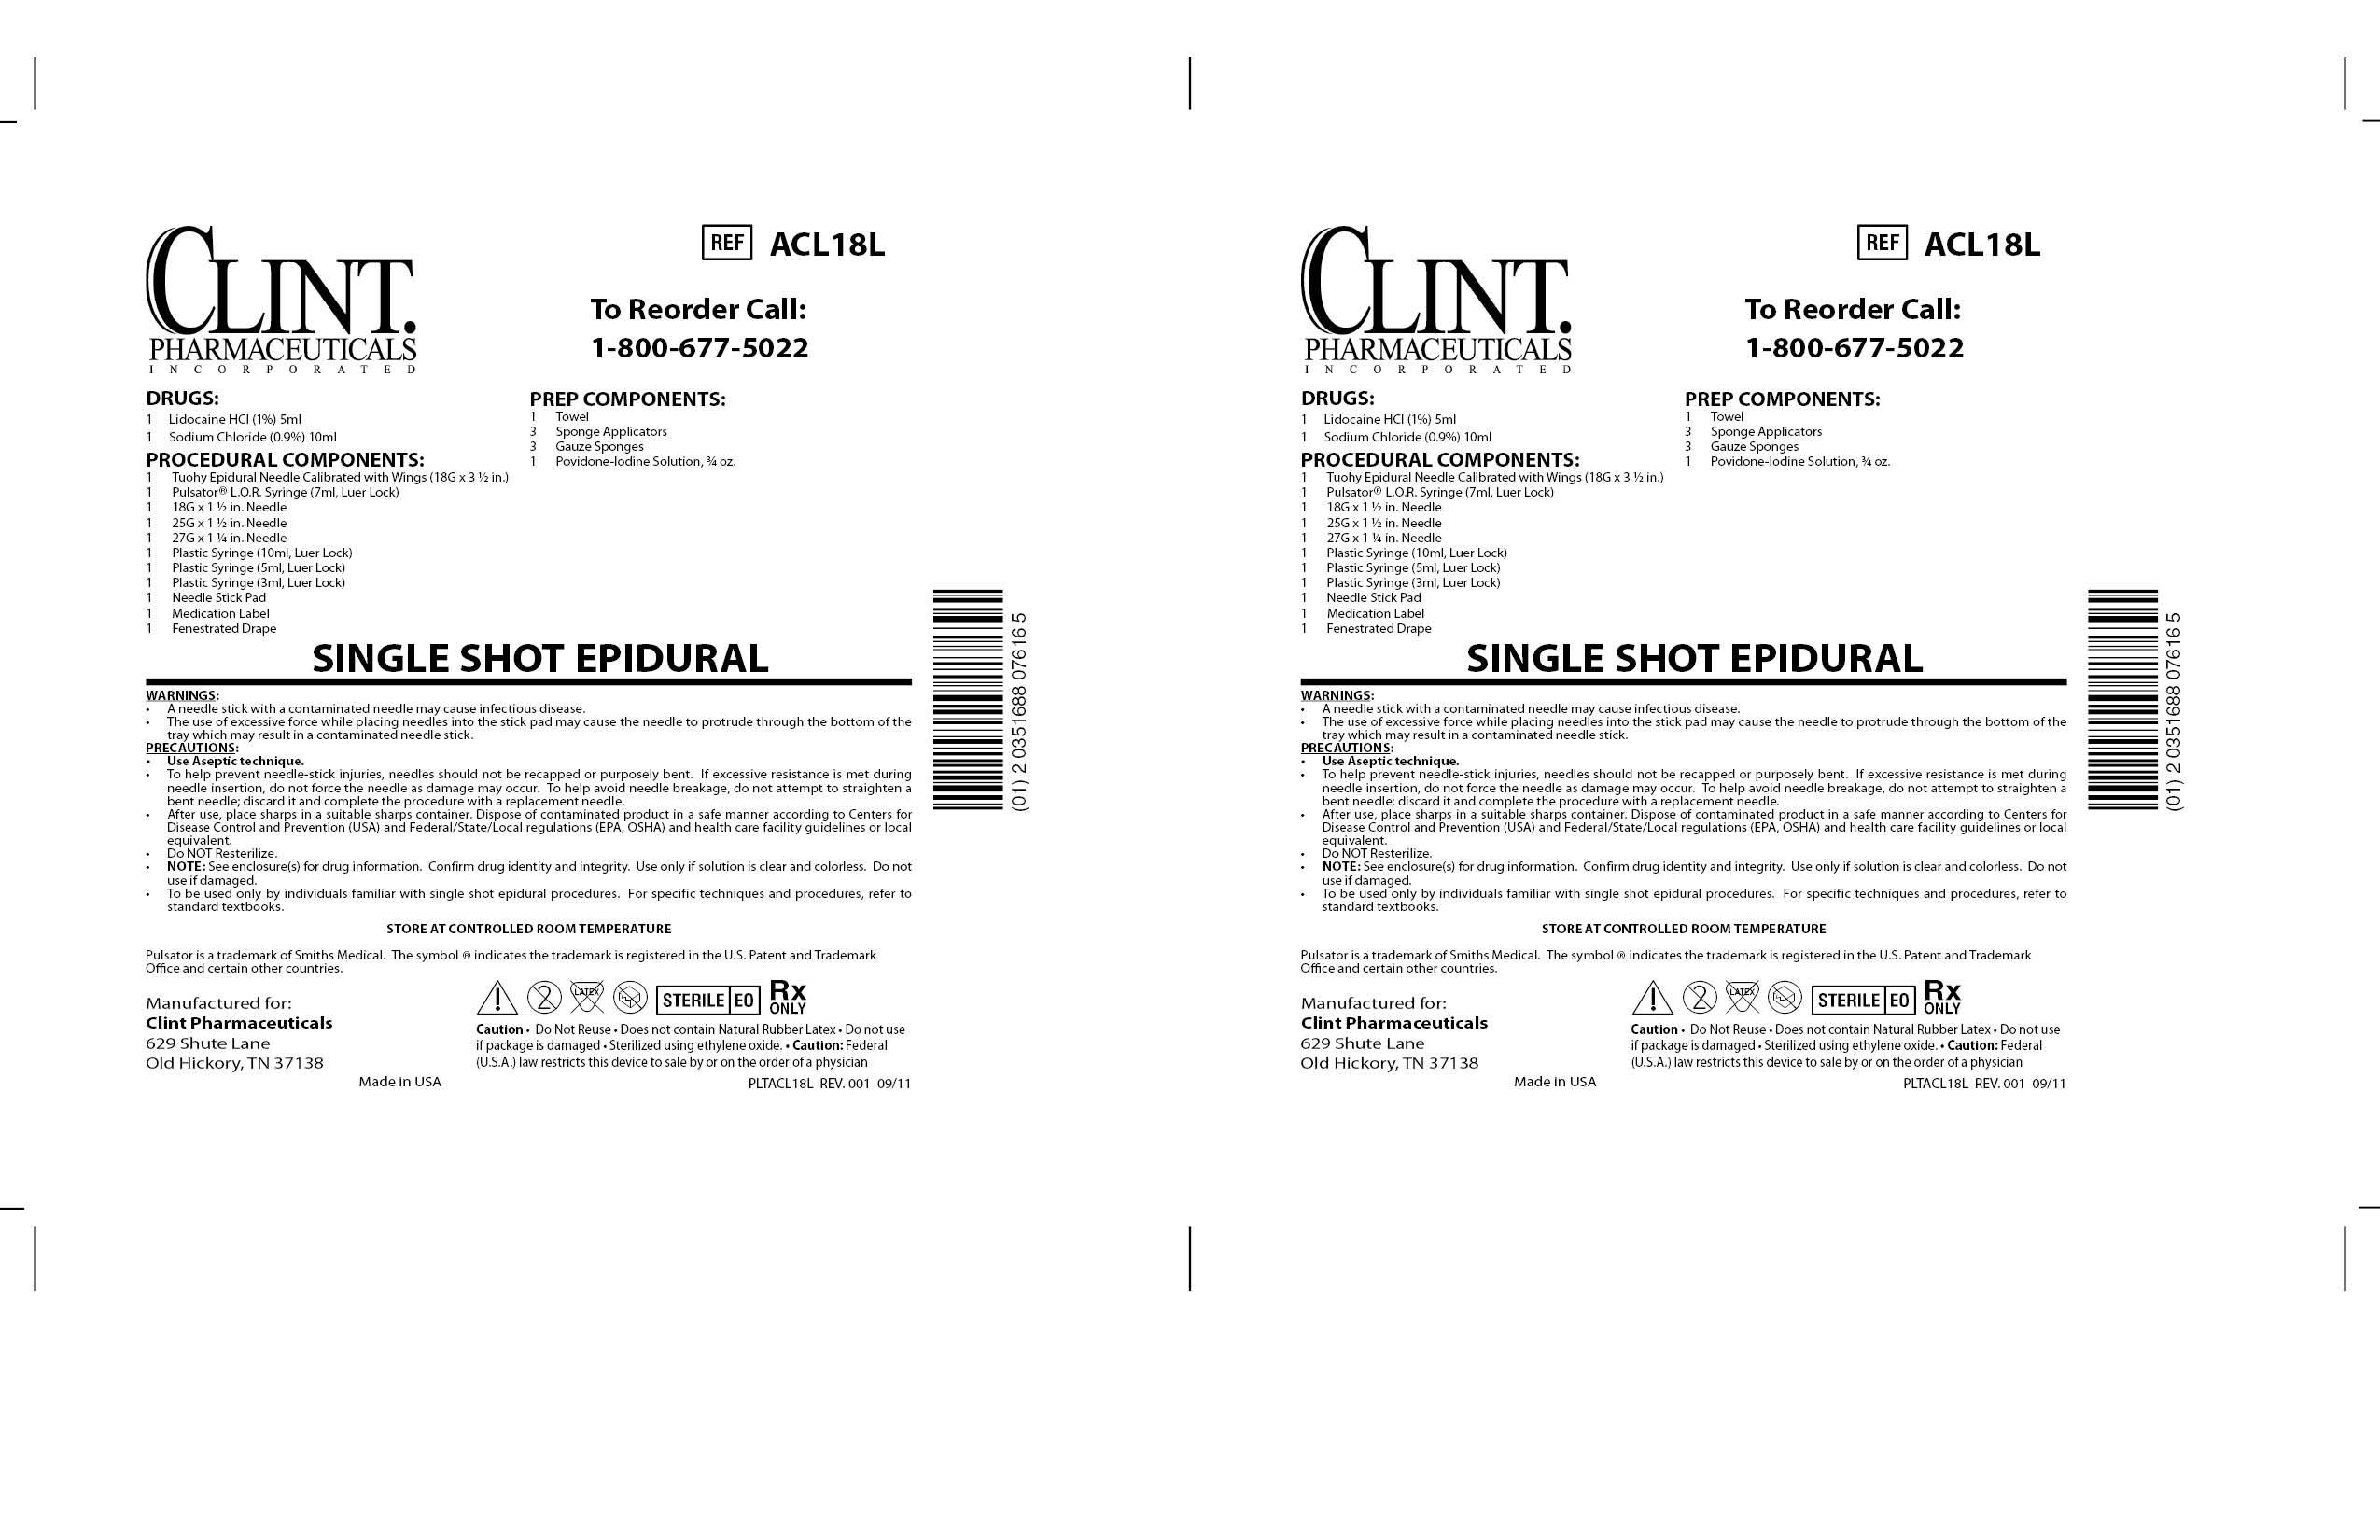 Acl18l Single Shot Epidural () Kit [Clint Pharmaceuticals, Inc.]